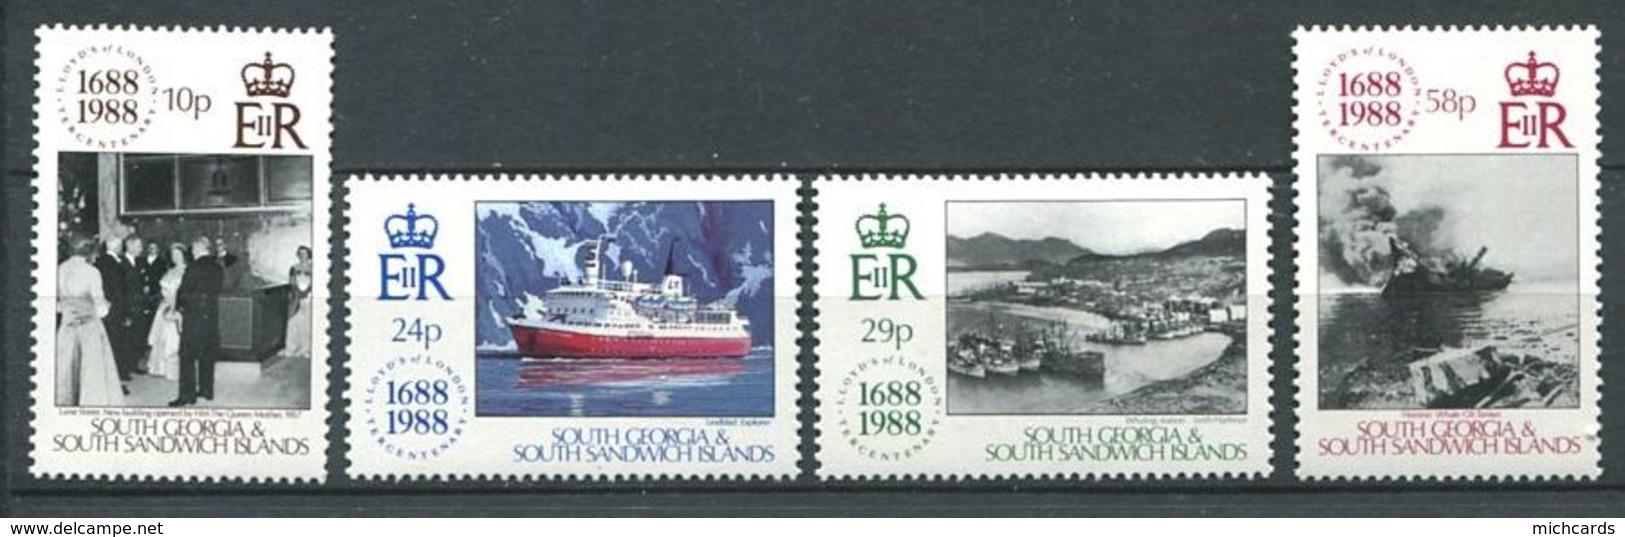 239 SUD GEORGIE 1988 - Yvert 188/91 - Lloyd Bateau - Neuf **(MNH) Sans Trace De Charniere - Géorgie Du Sud